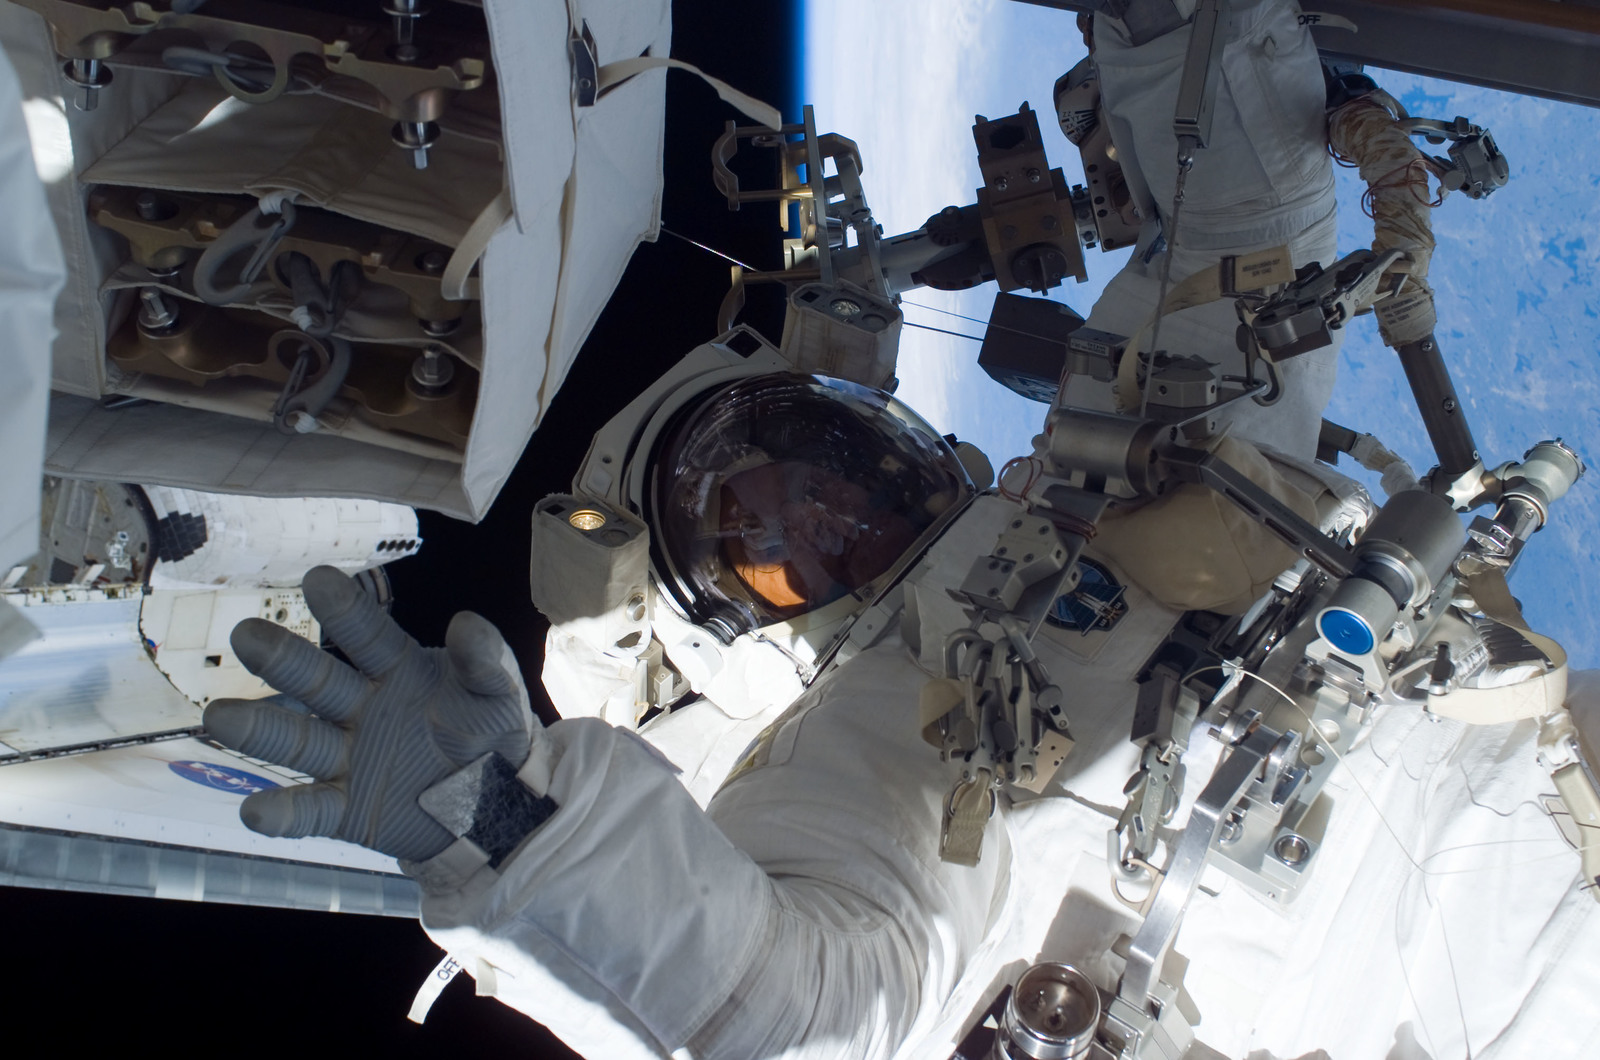 S115E05847 - STS-115 - Burbank prepares the SARJ on the P3 - P4 Truss Segment